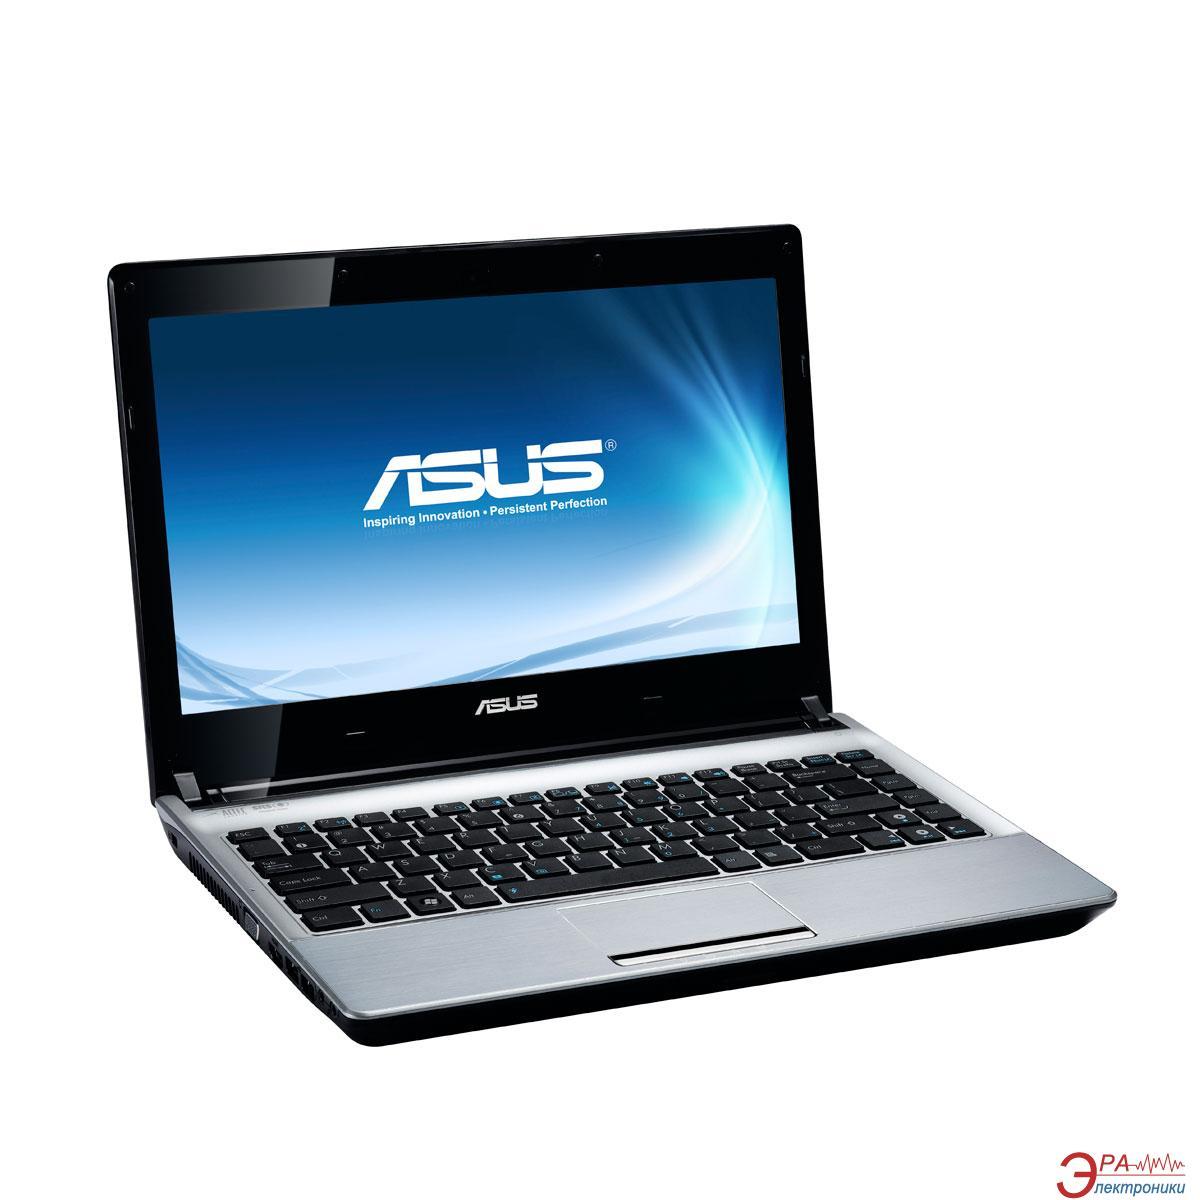 Ноутбук Asus U30SD-RX051D (U30SD-2410M-S4EDAN) Silver 13,3